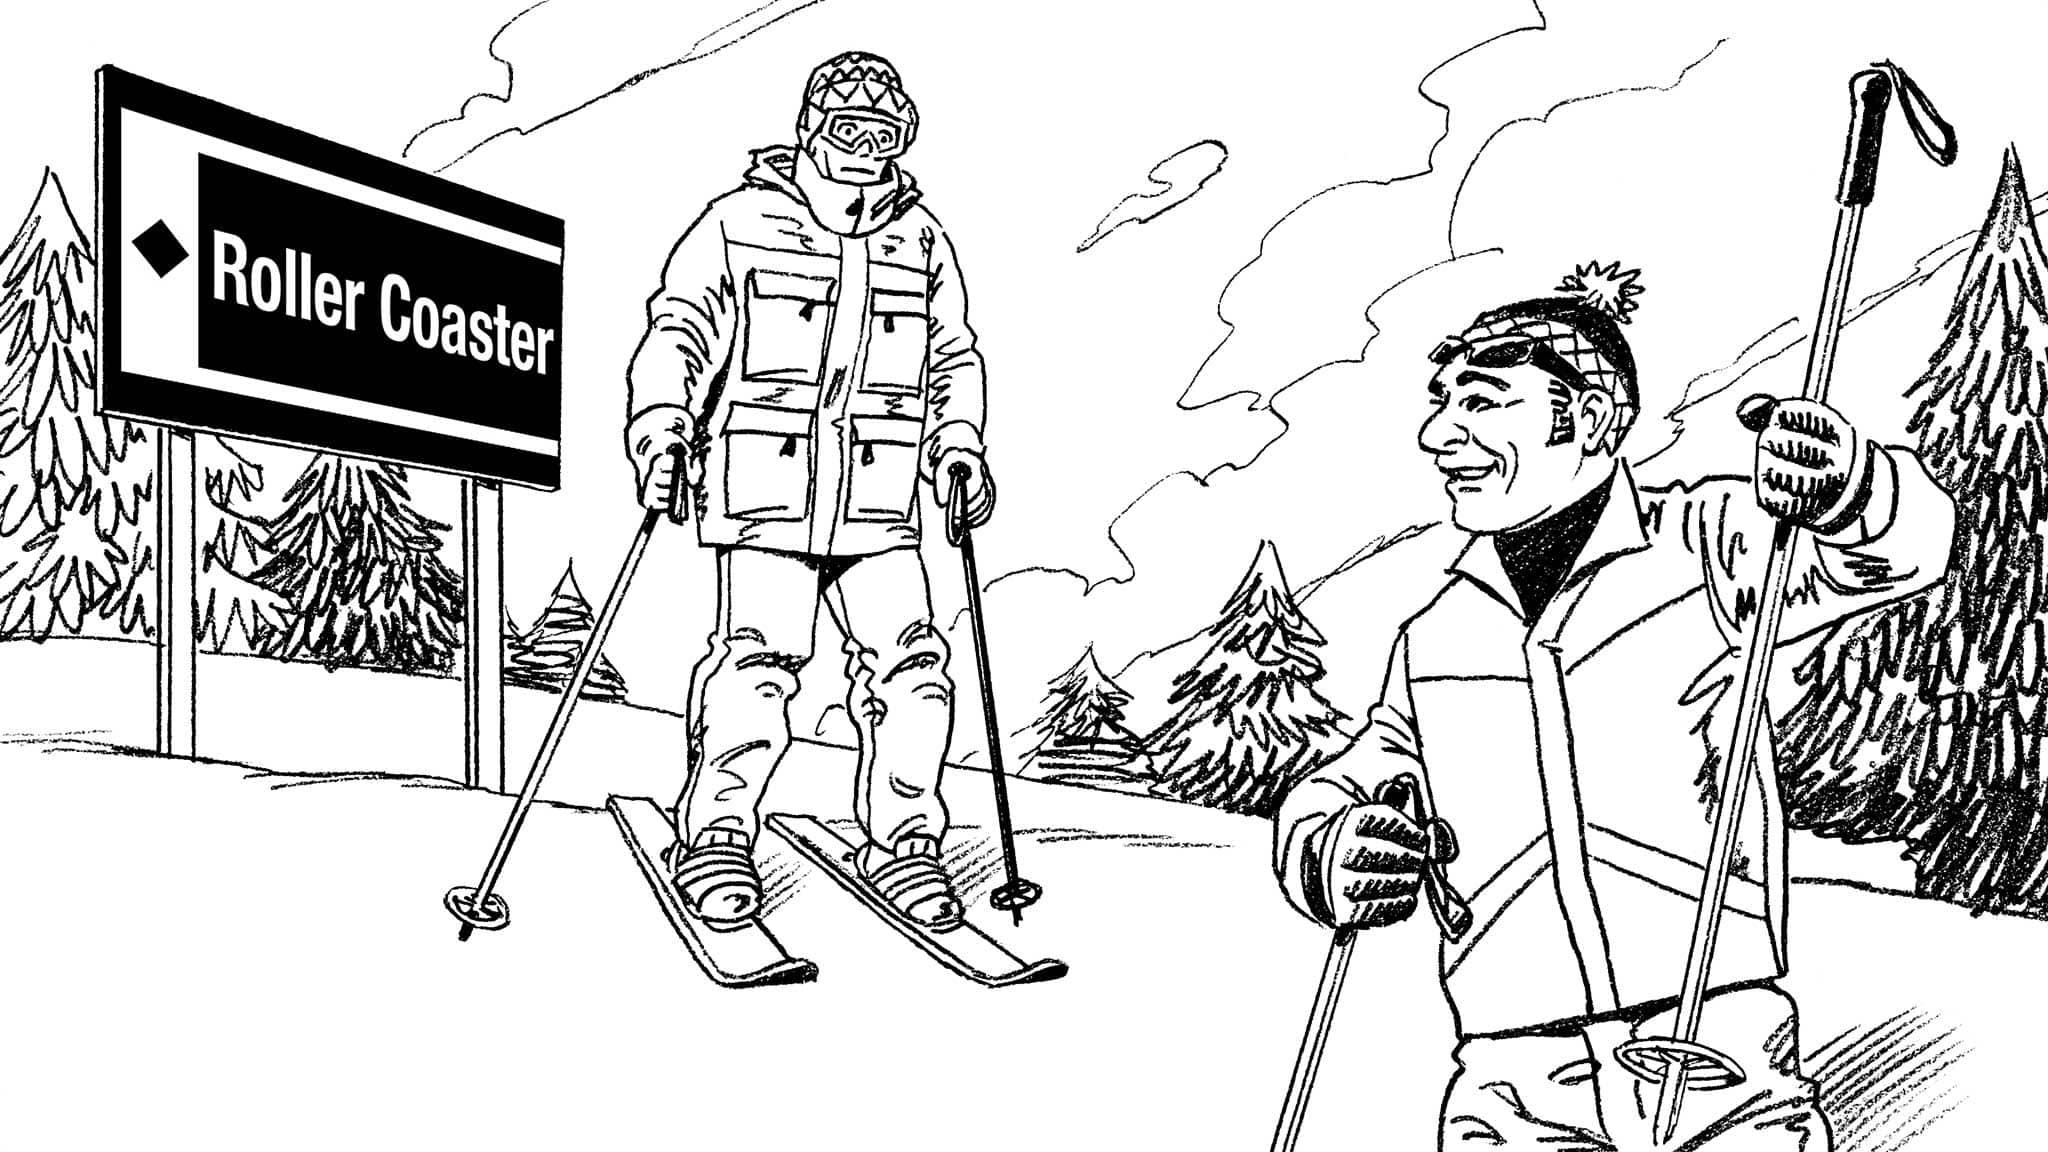 KH3152C02-snow-skiers